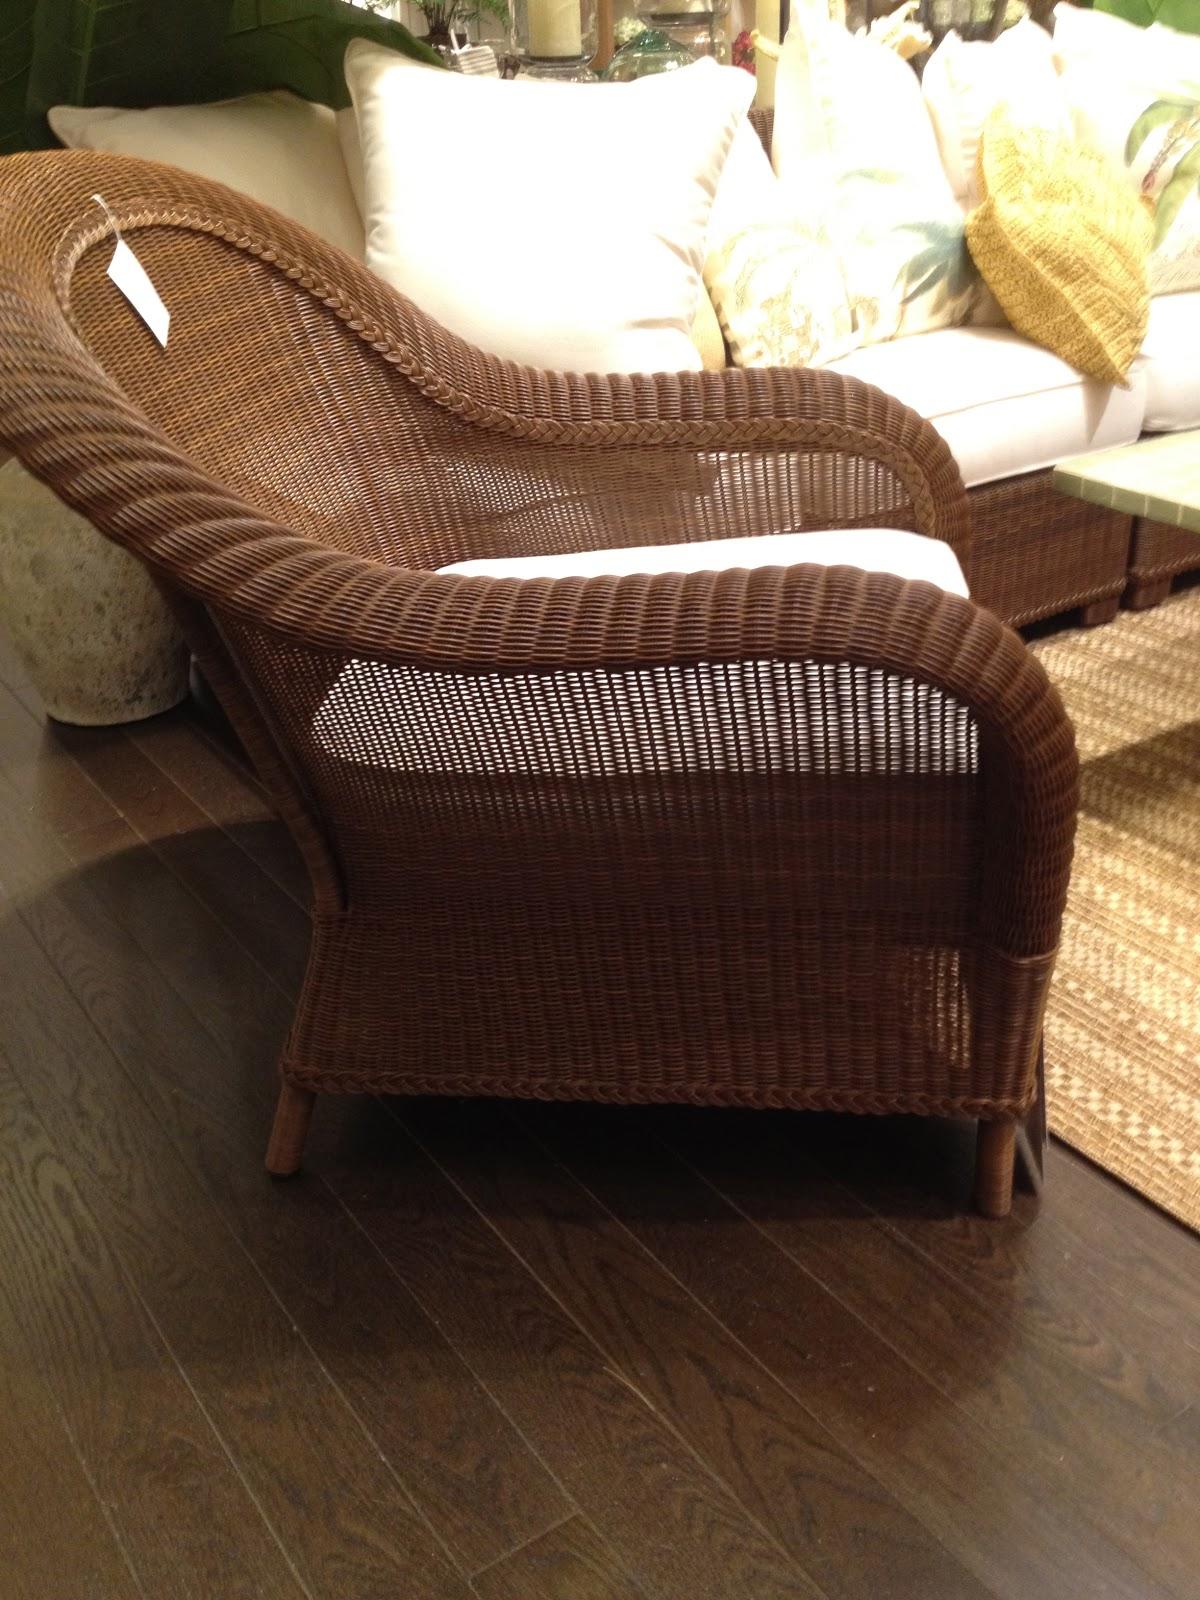 Mauna Lani Furniture Outdoor Pottery Barn Fabric for